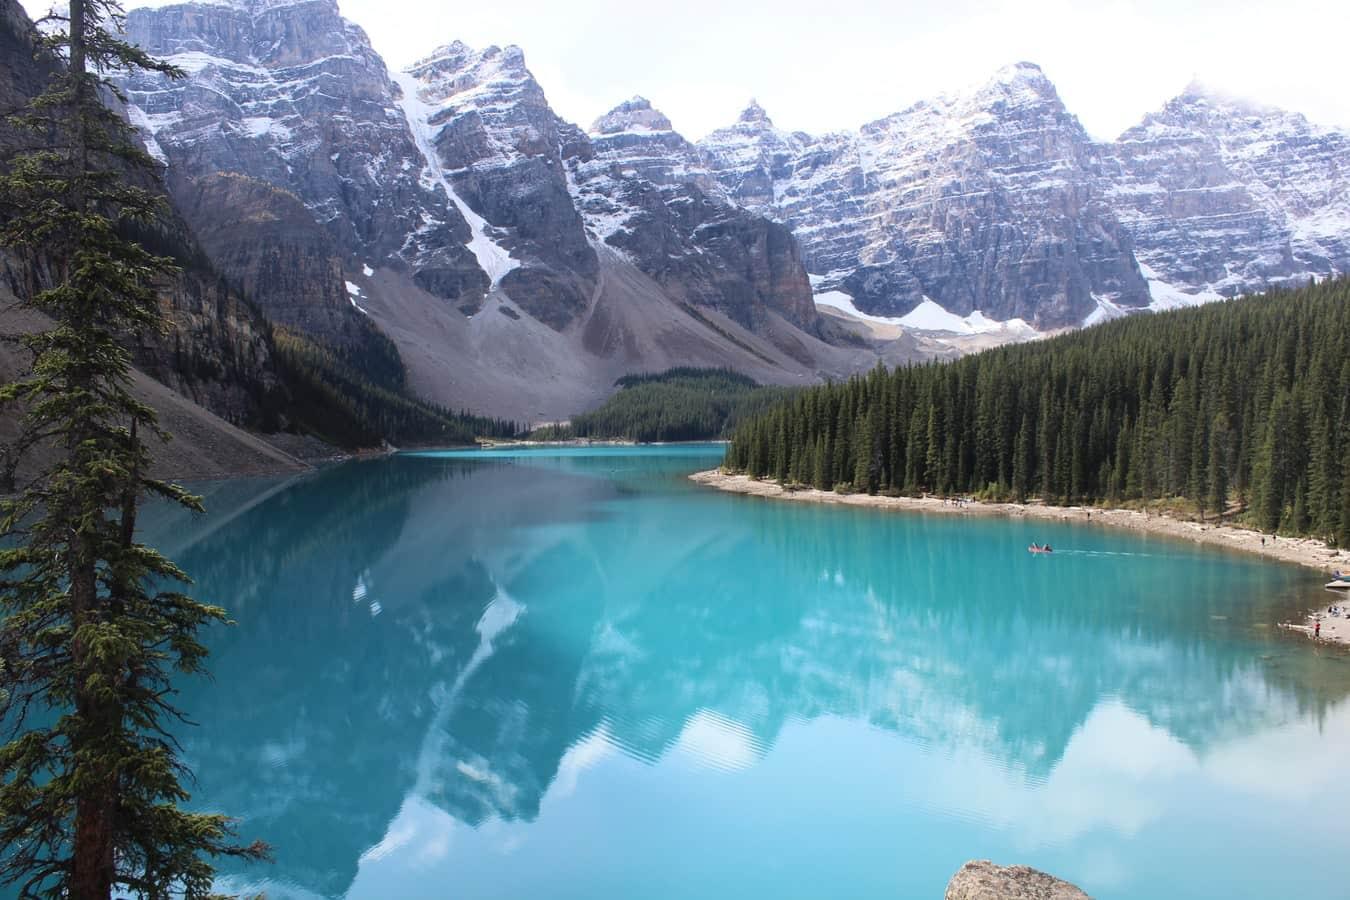 moraine lake, Canada, Alberta, Banff national park,